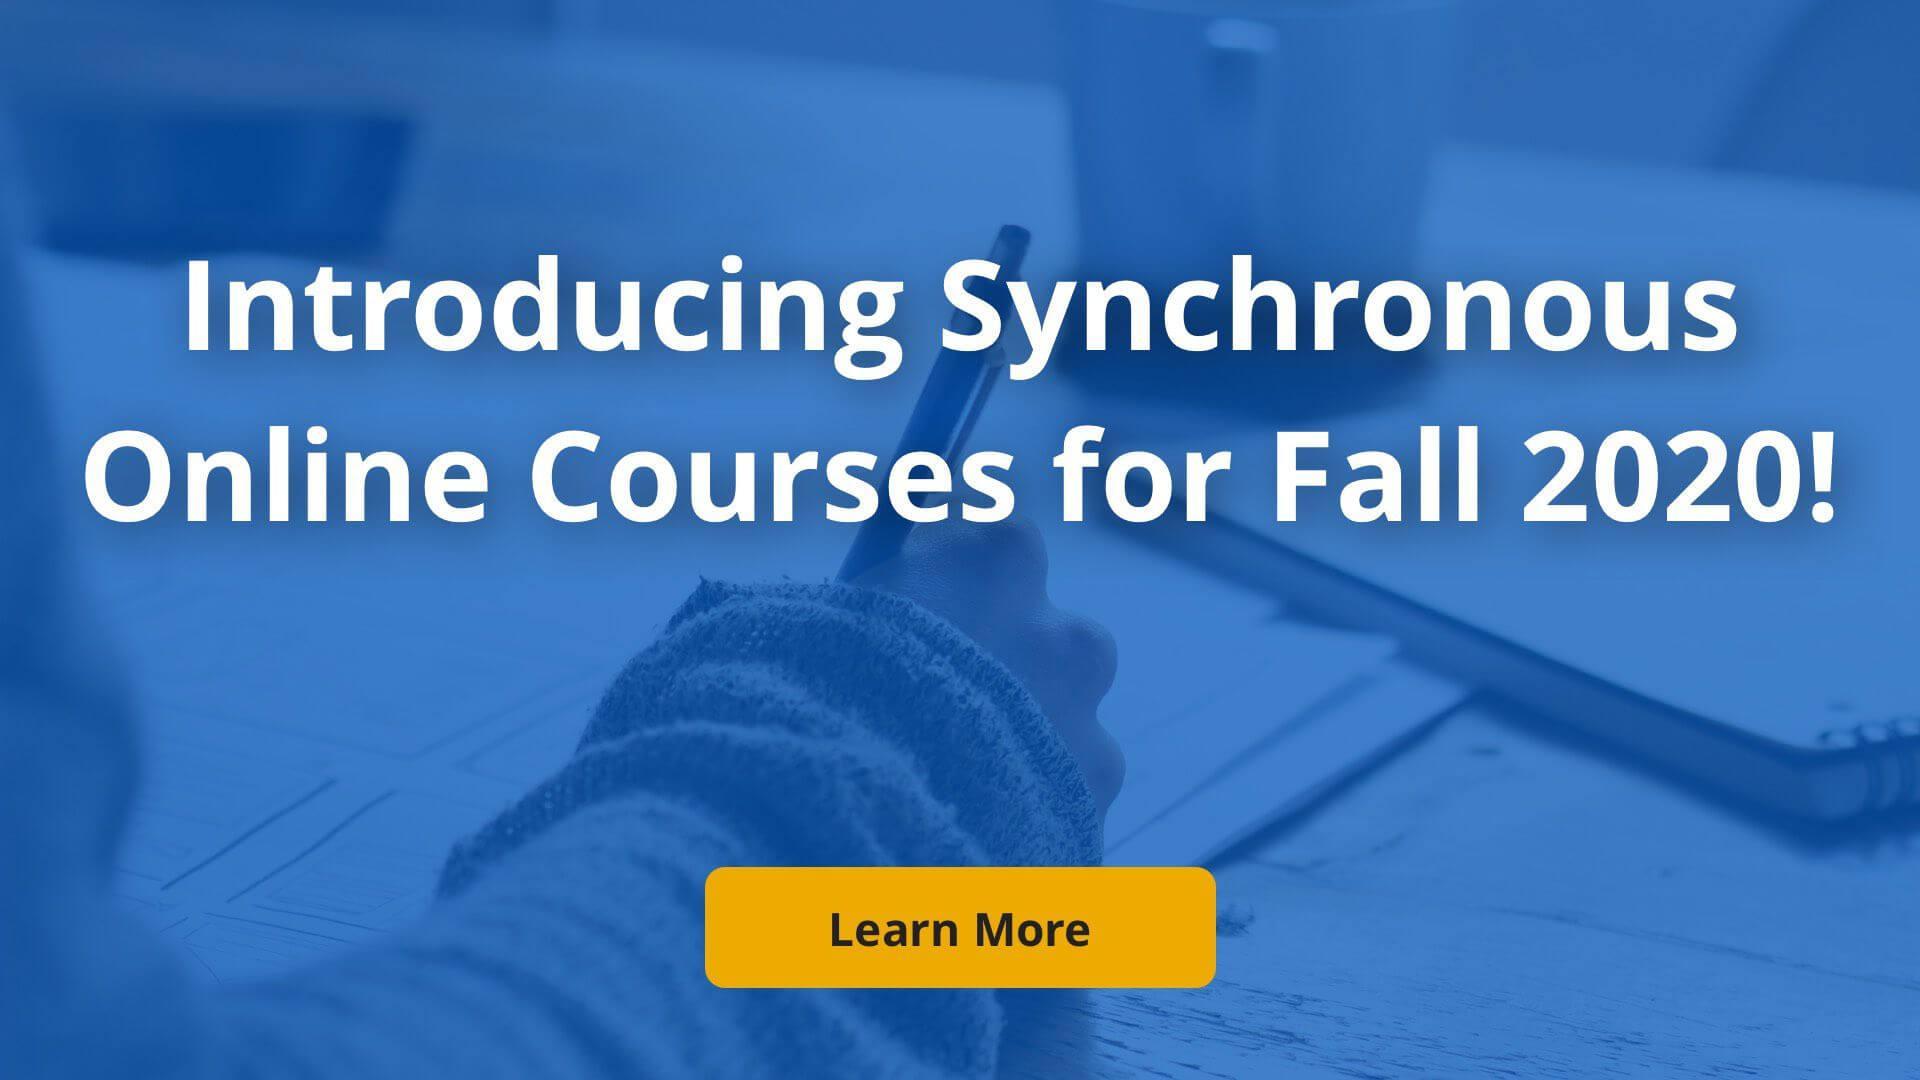 Synchronous Online Courses